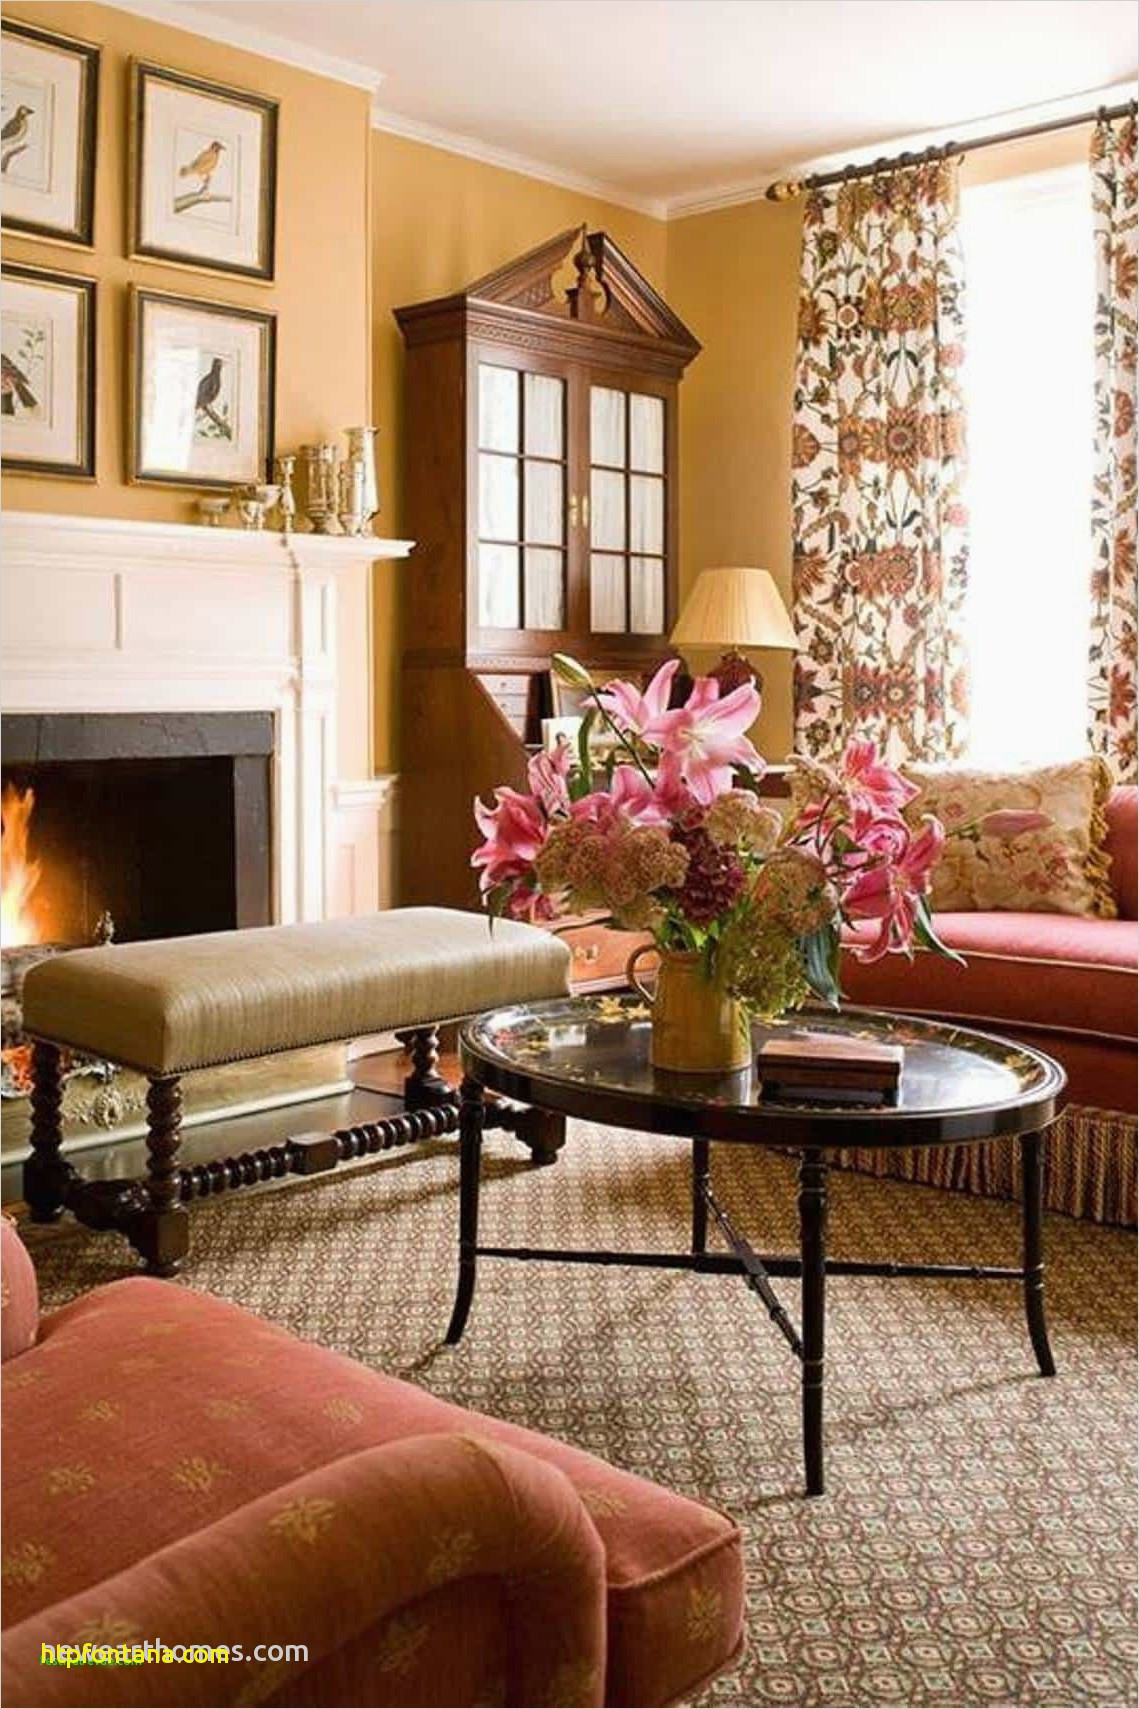 living room vase with sticks of vase with sticks new luxury modern living room vases nicnacmag in vase with sticks new luxury modern living room vases